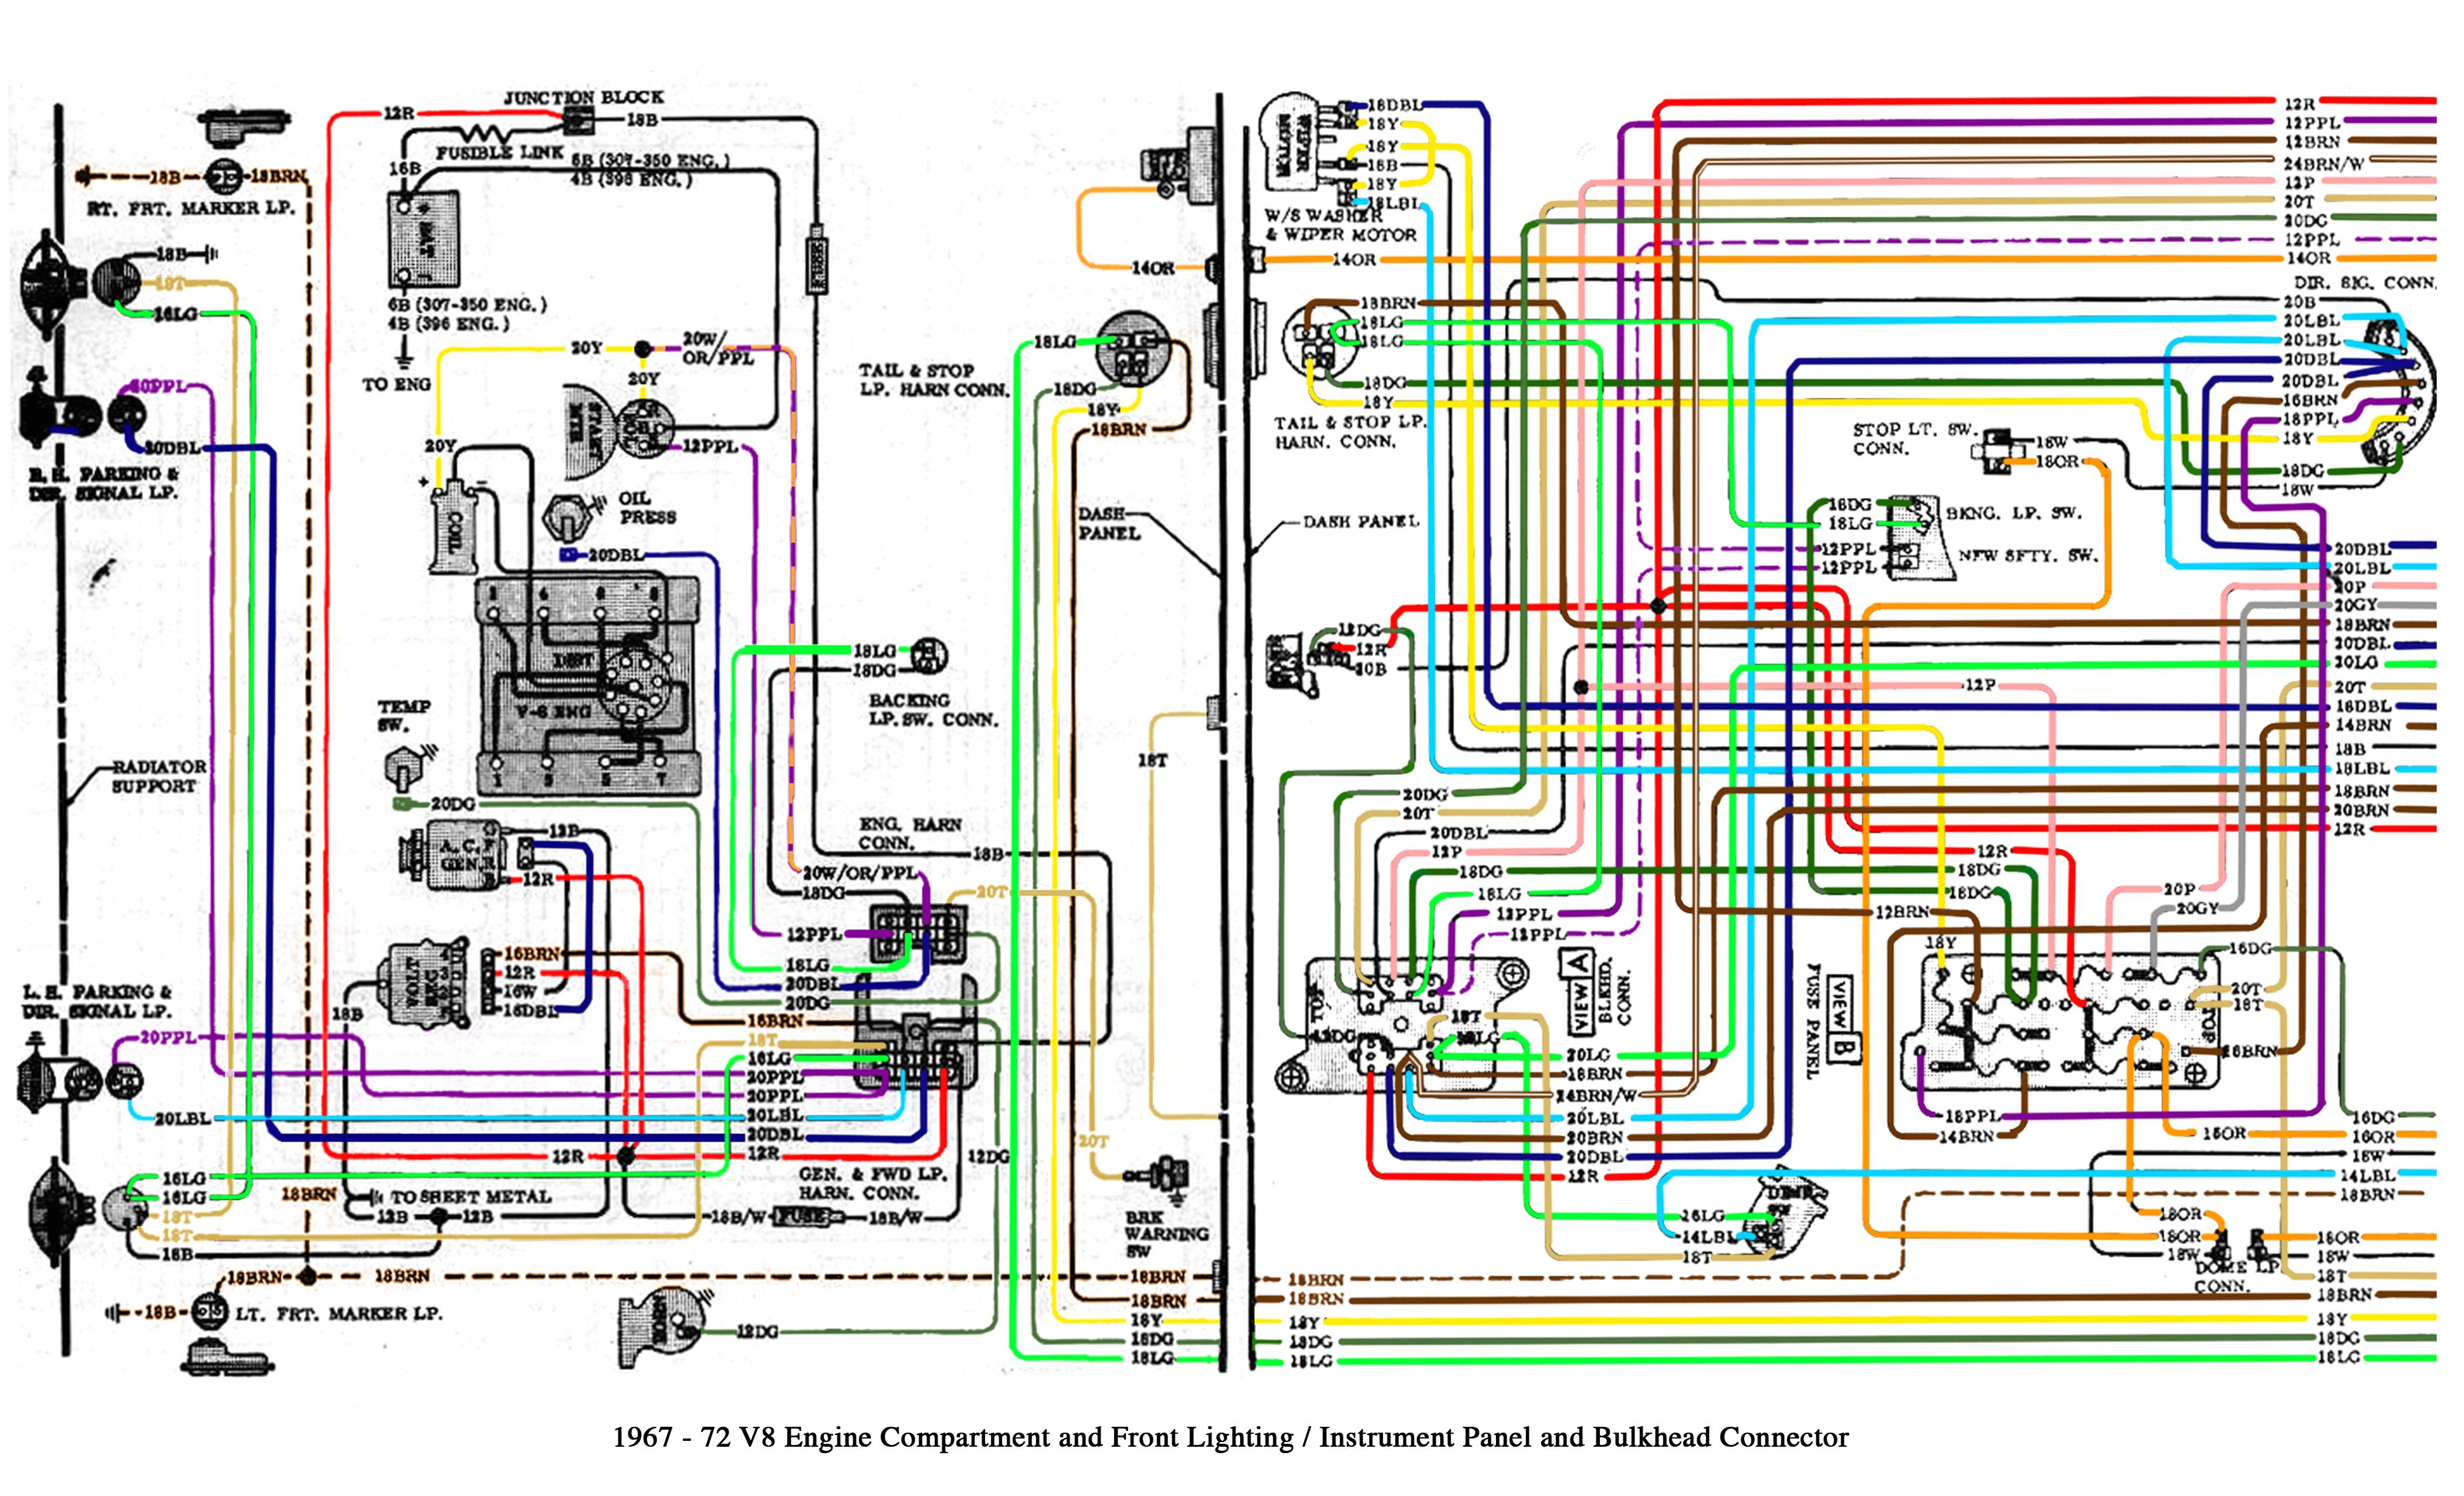 c10 chevy truck wiring harness wiring diagram long1970 chevy c10 wiring harness wiring diagrams favorites c10